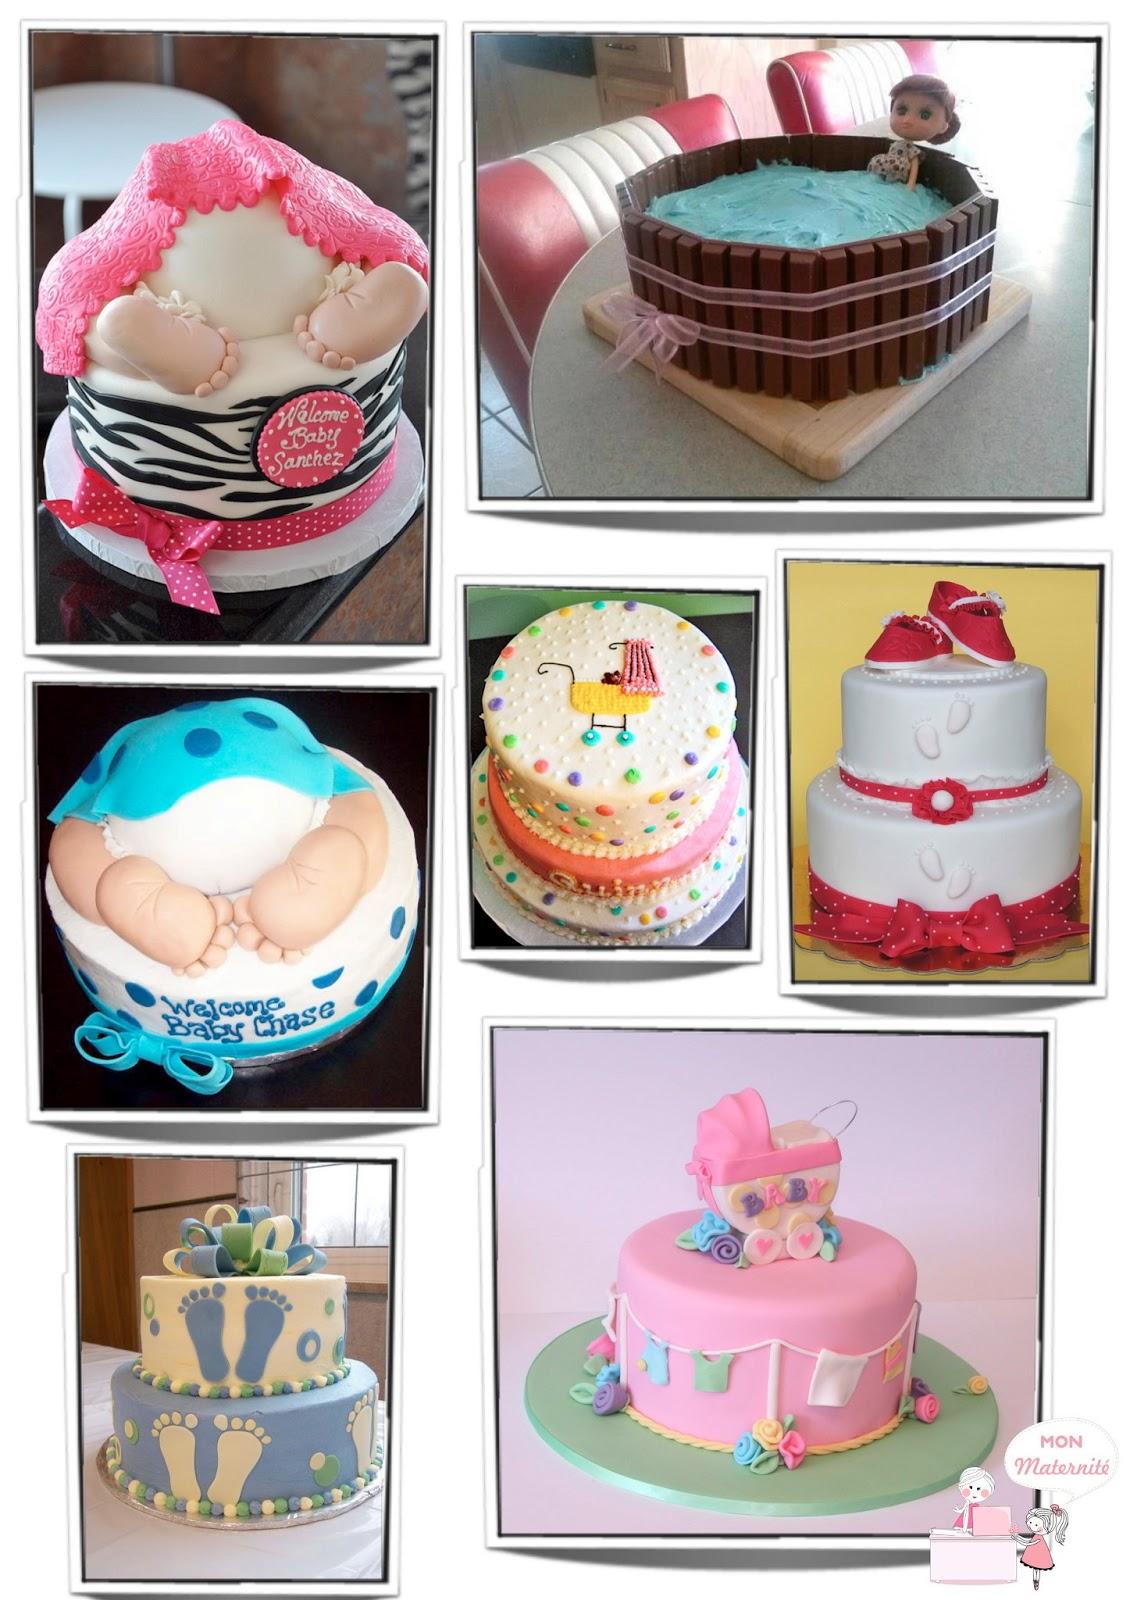 ideias de bolo para chá de bebê mon maternité